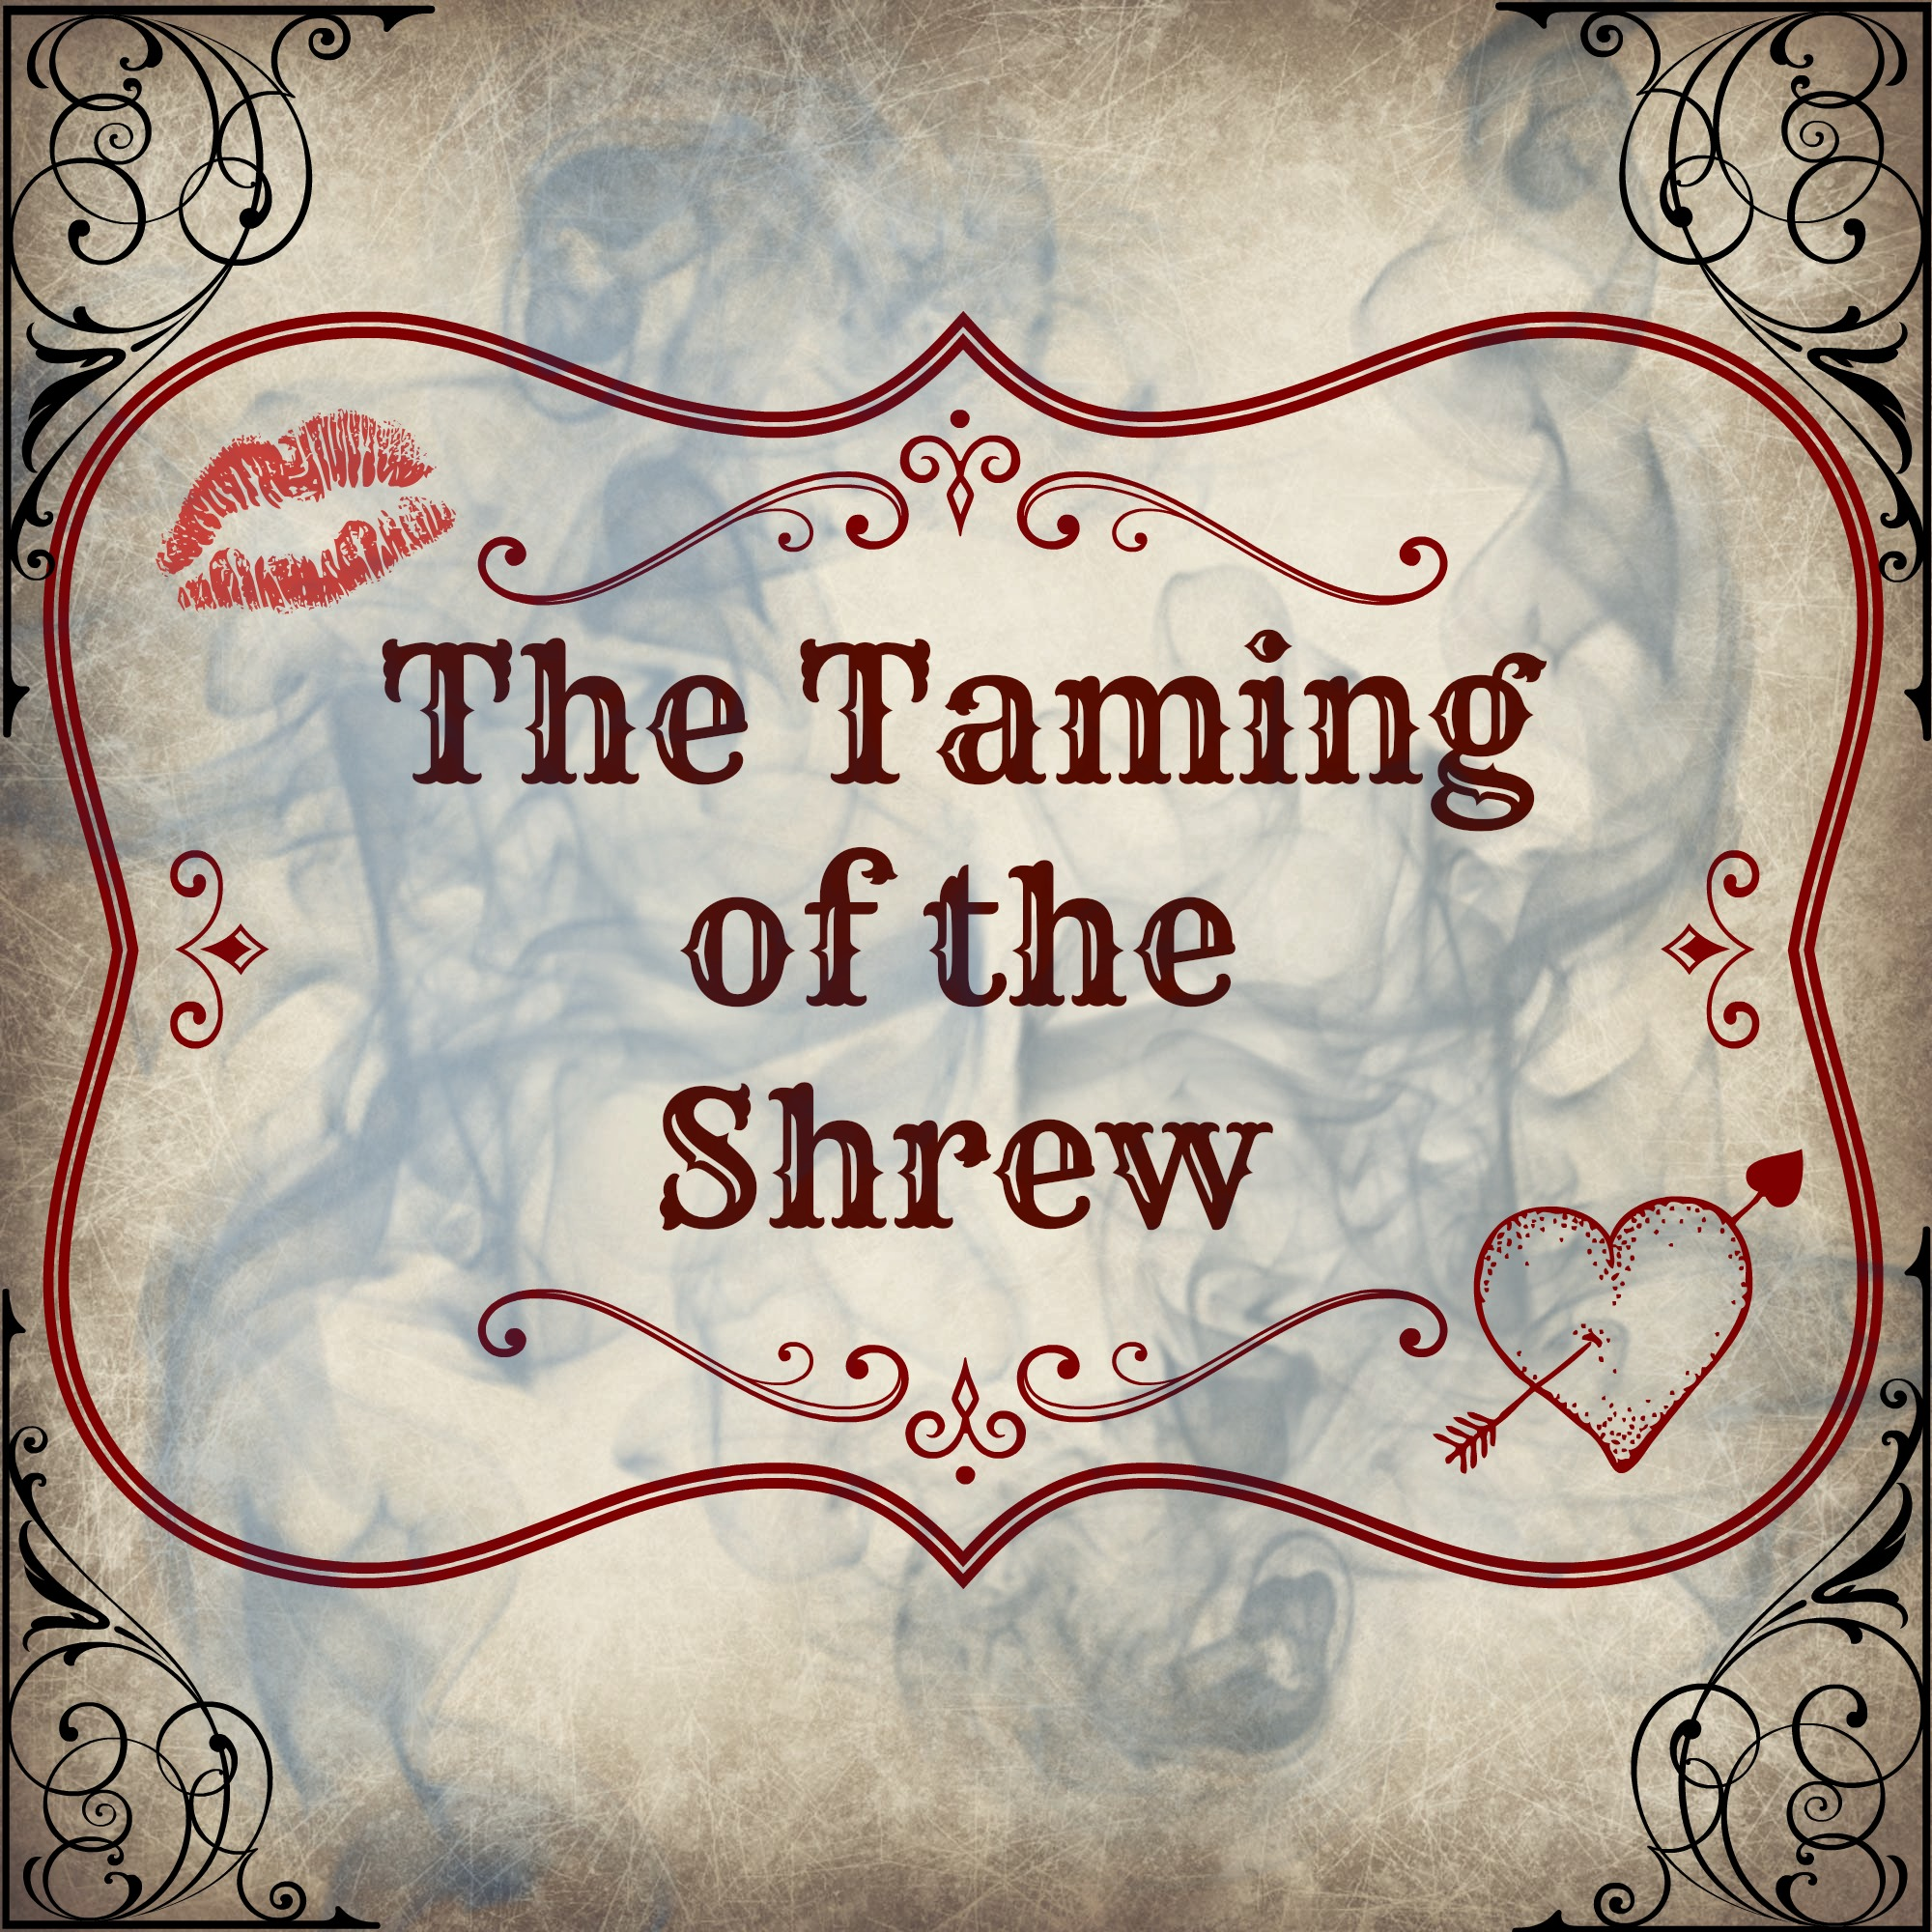 Taming of the Shrew draft 2.jpg